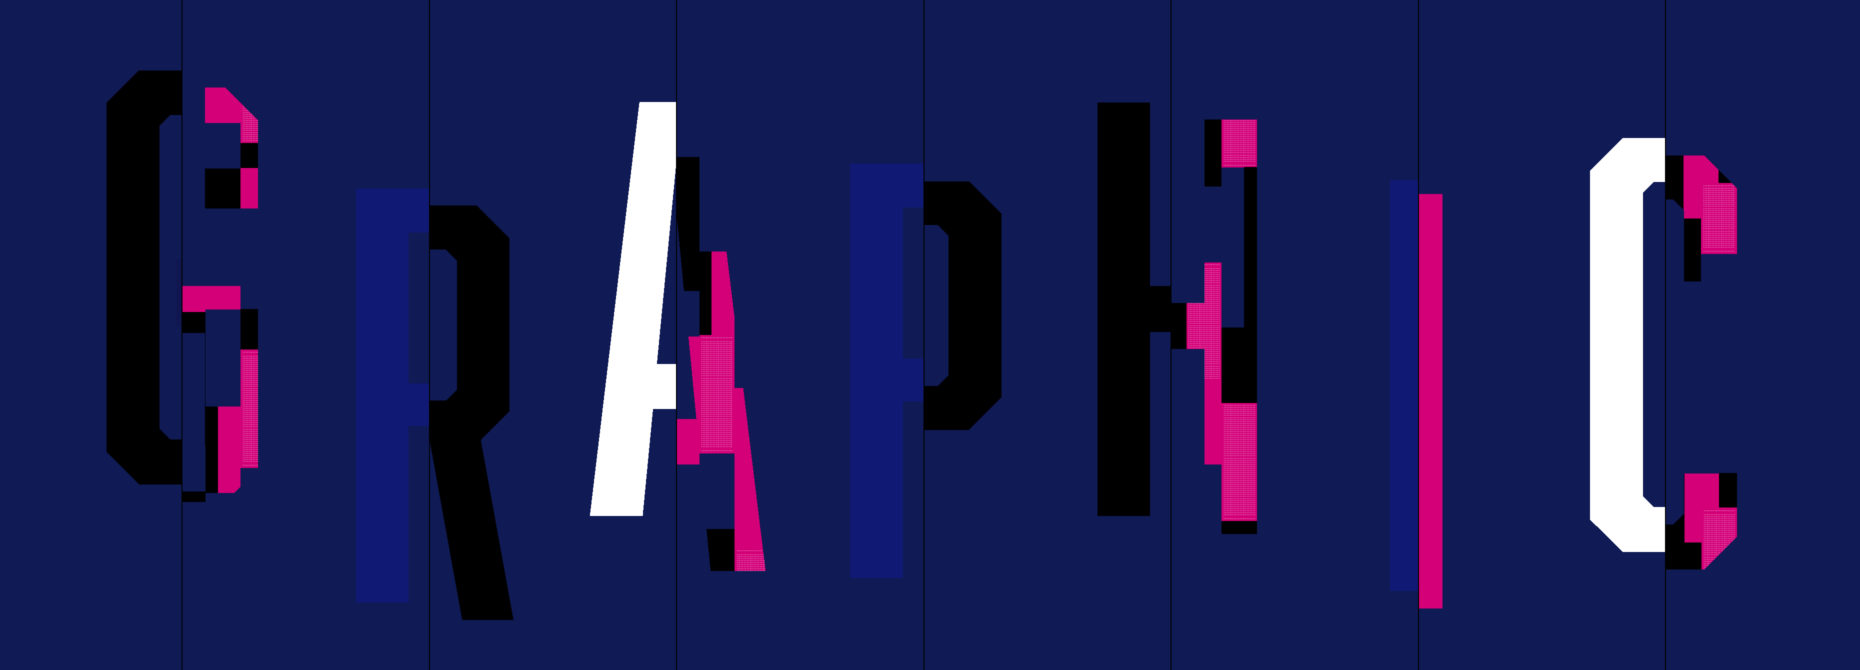 <span>Graphic</span>